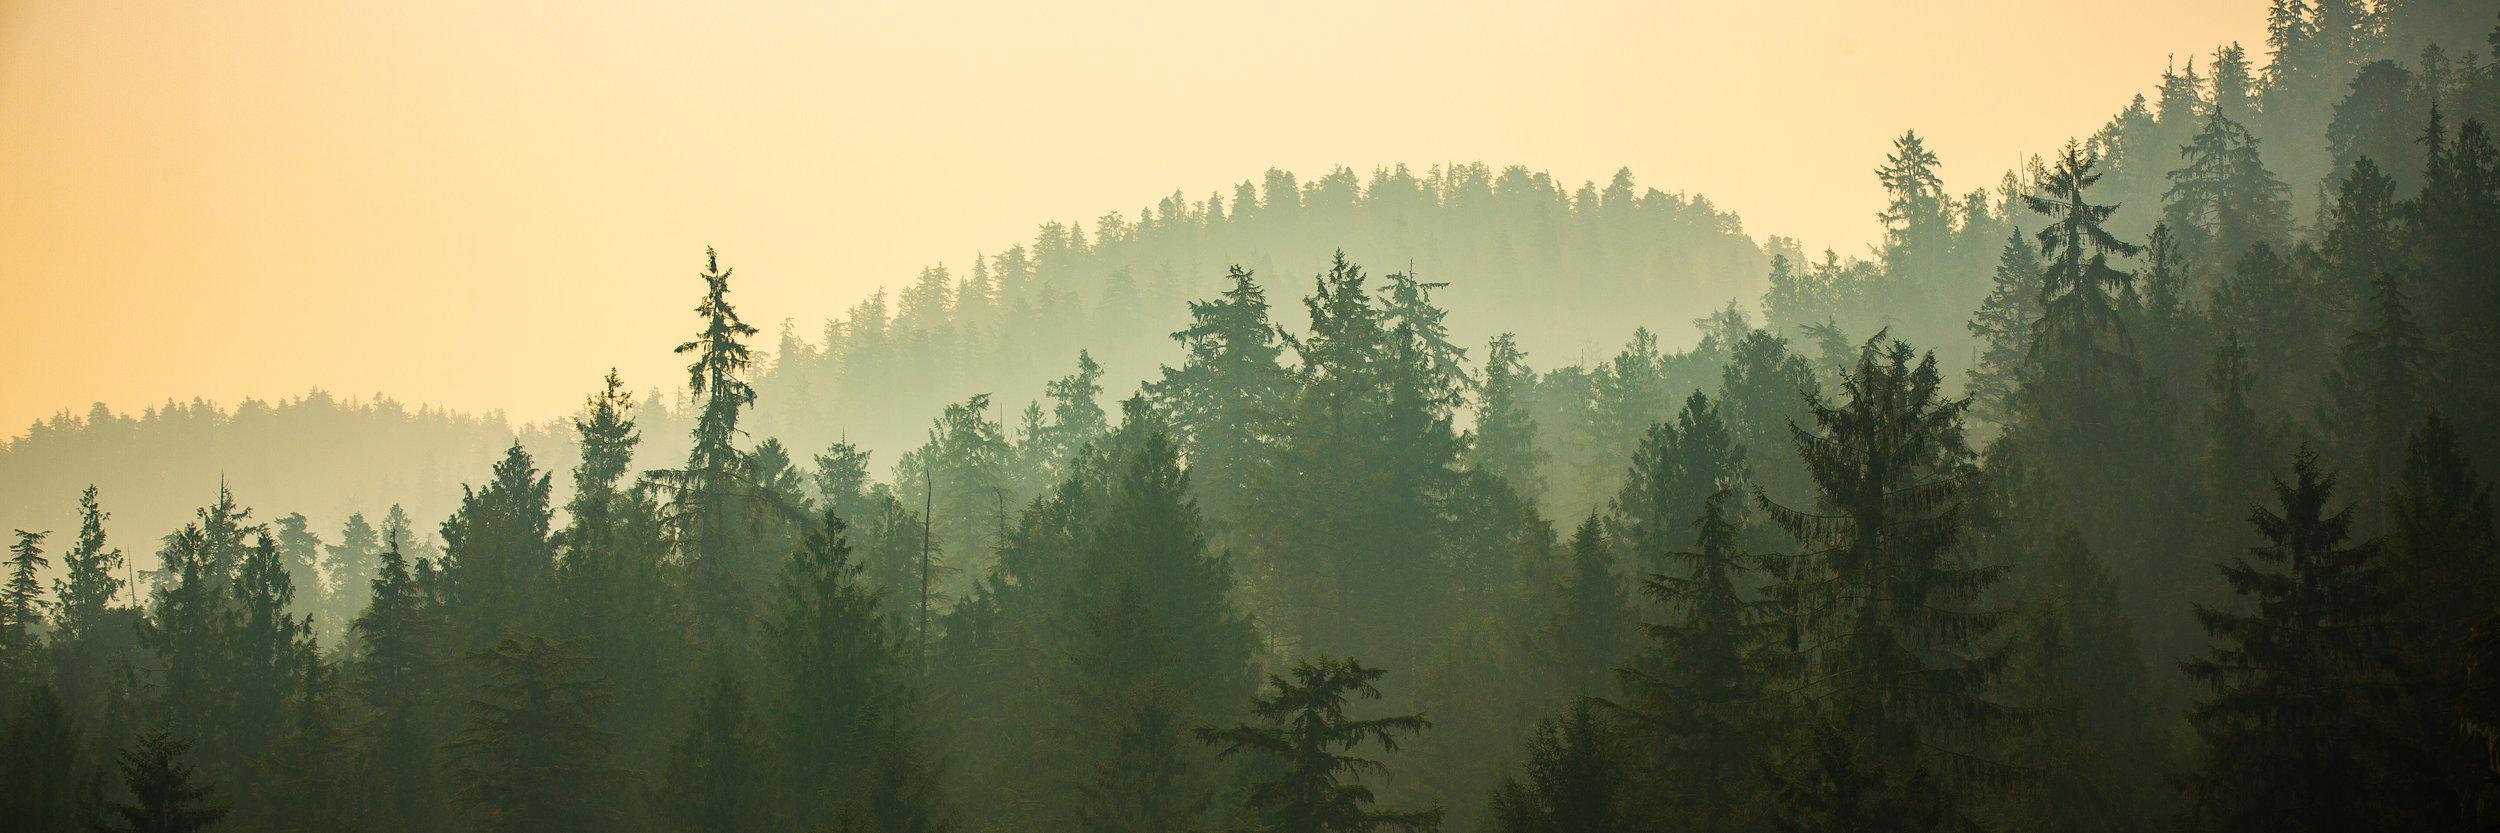 Image-72-landscape-smokeytrees-1.jpg